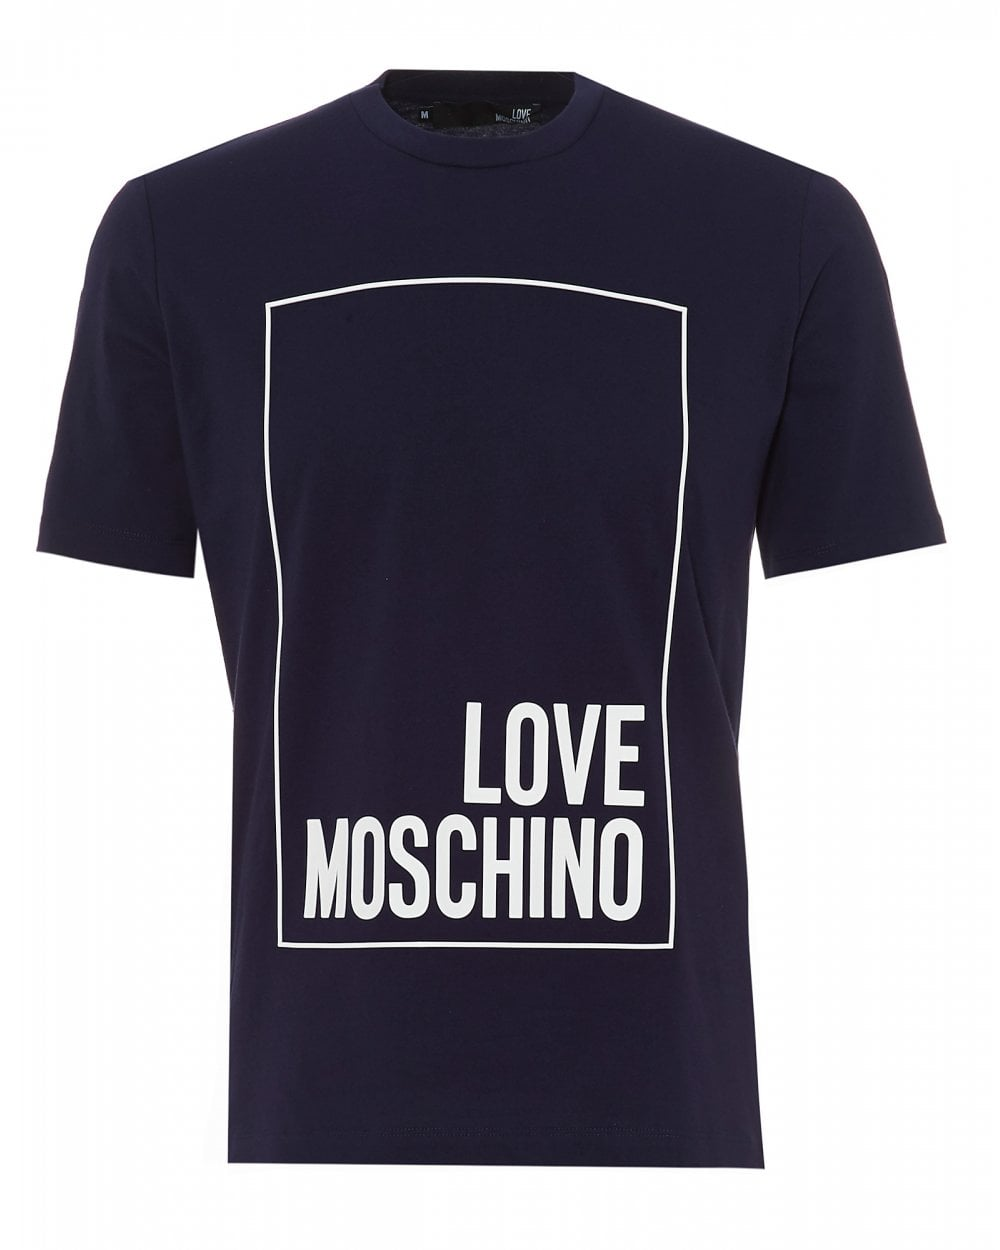 e1bab242ffbad Love Moschino Mens Box Logo T-Shirt, Regular Fit Navy Blue Tee